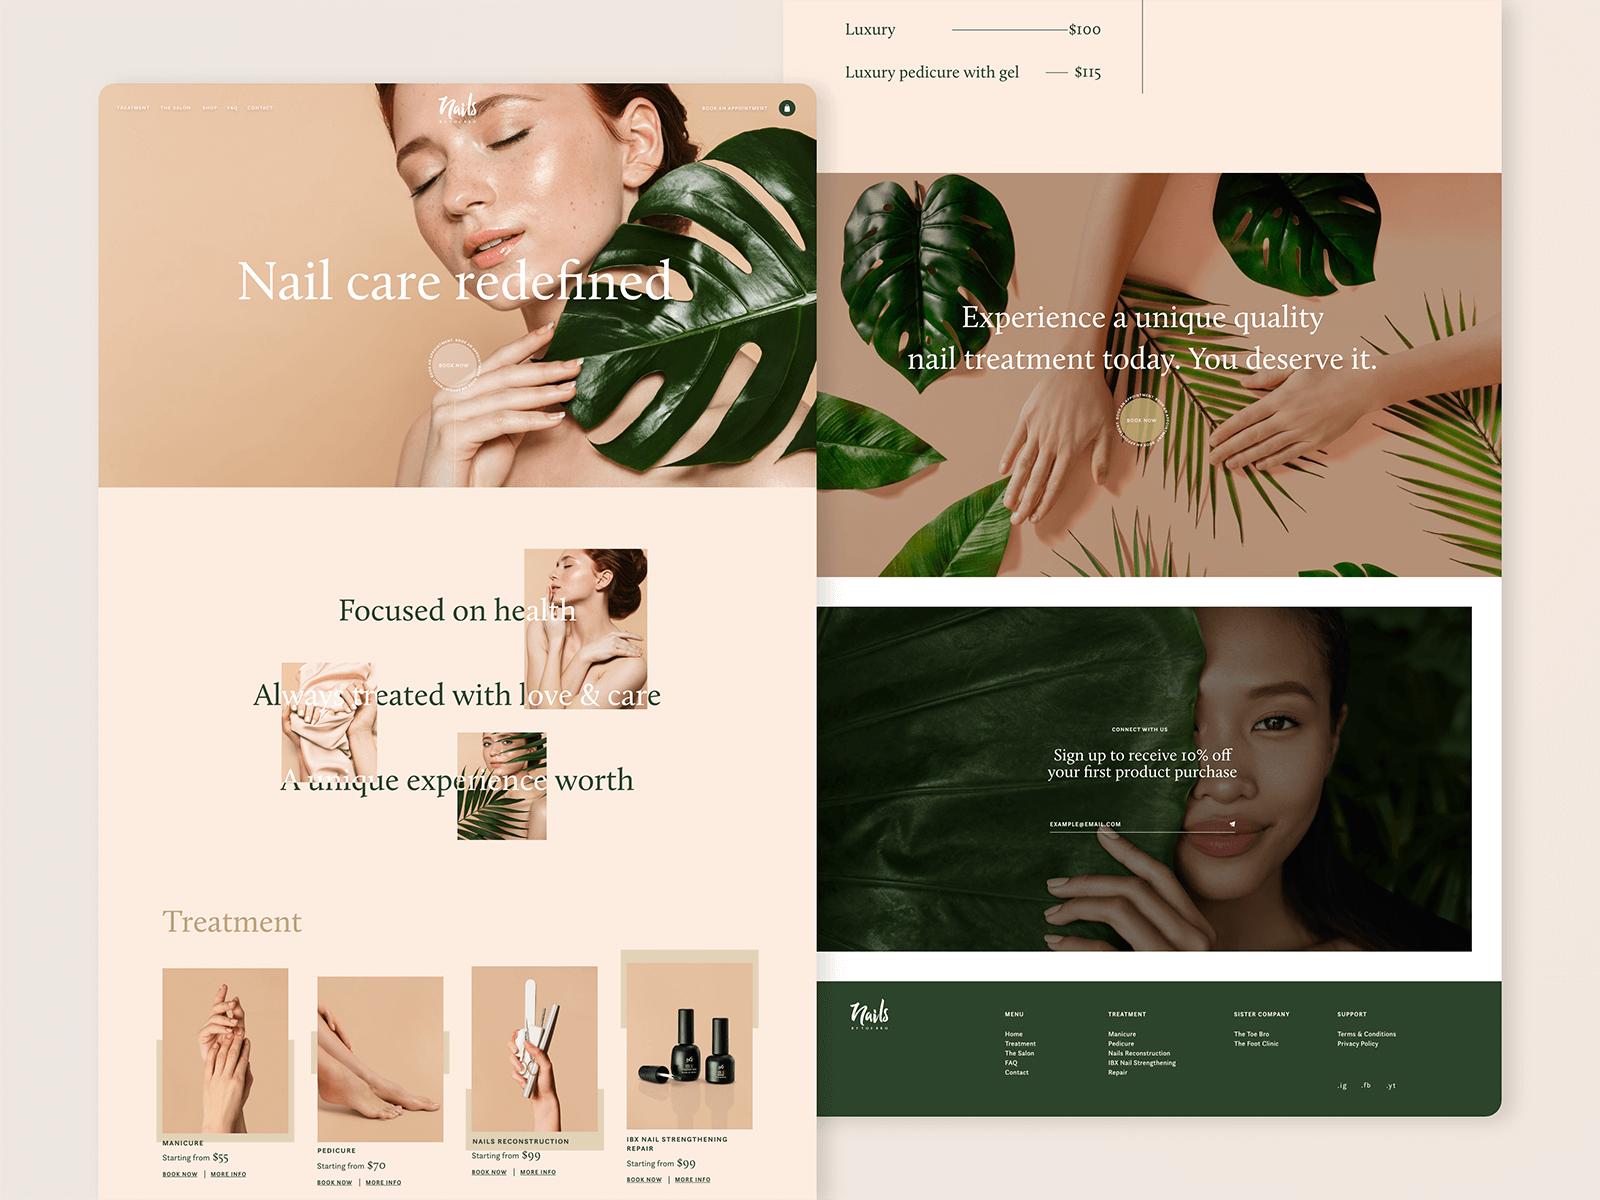 Nails by Toe Bro